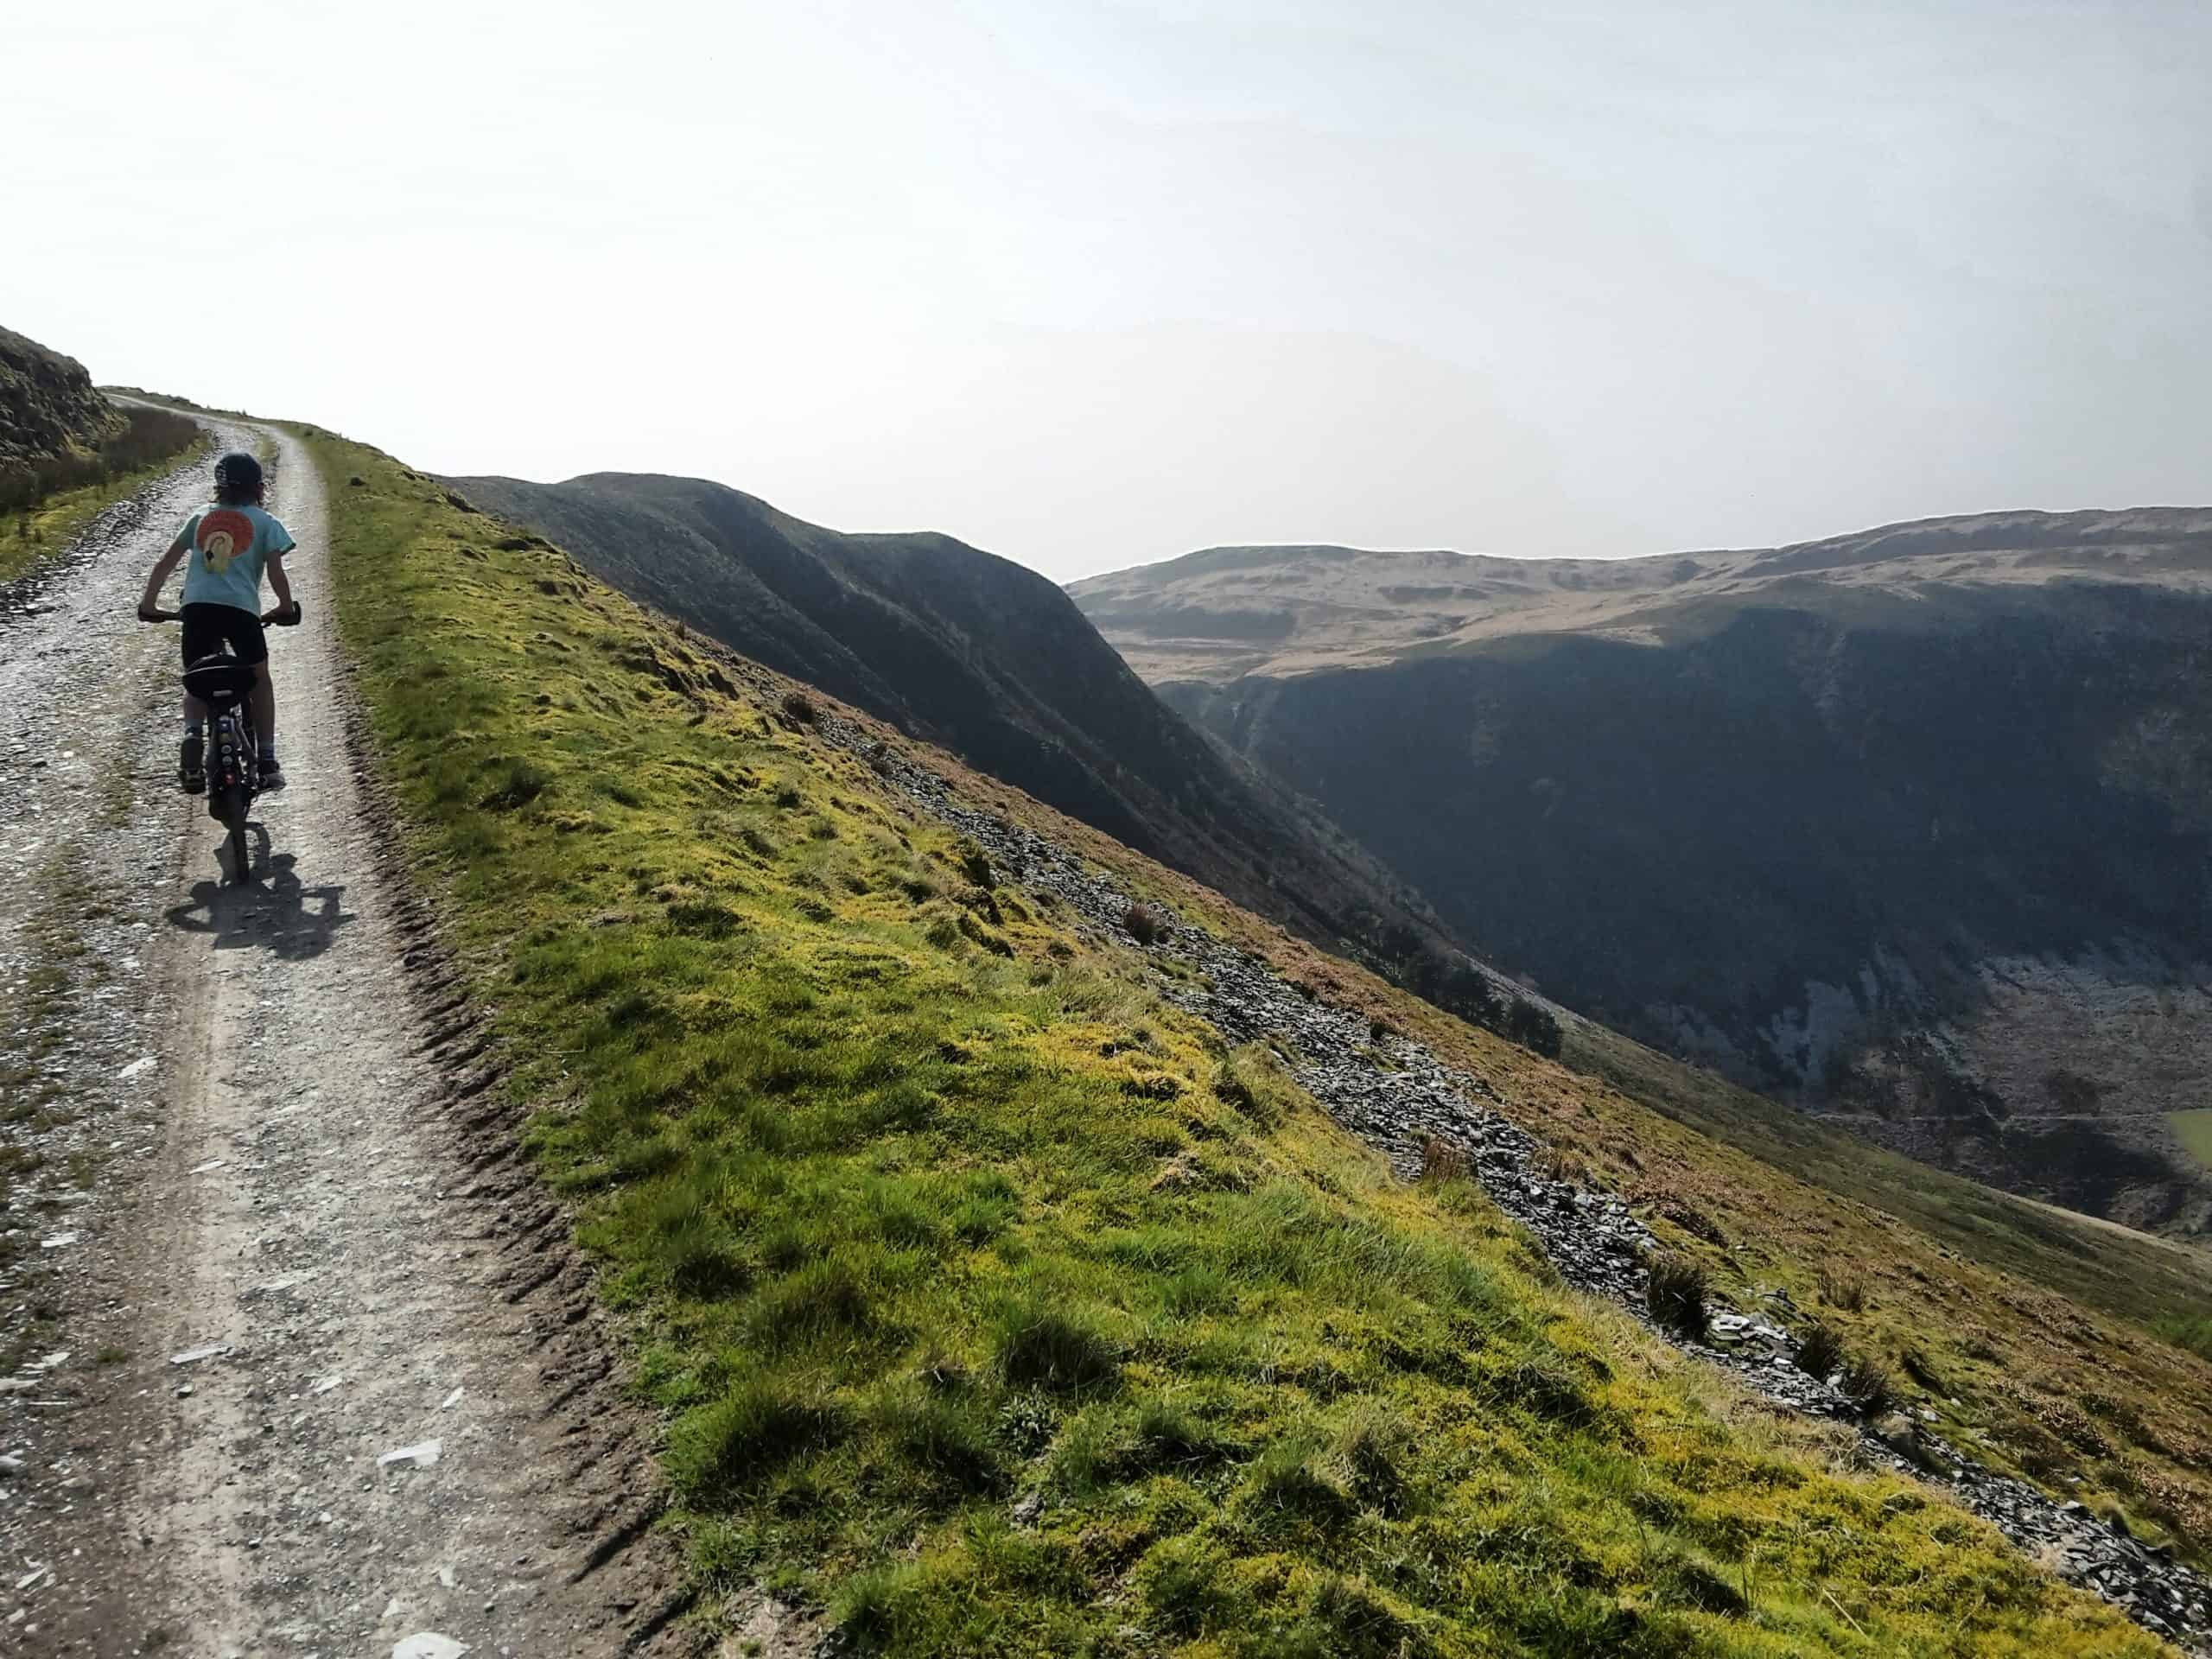 Snowdonia: Climbing Up, Riding Back 89